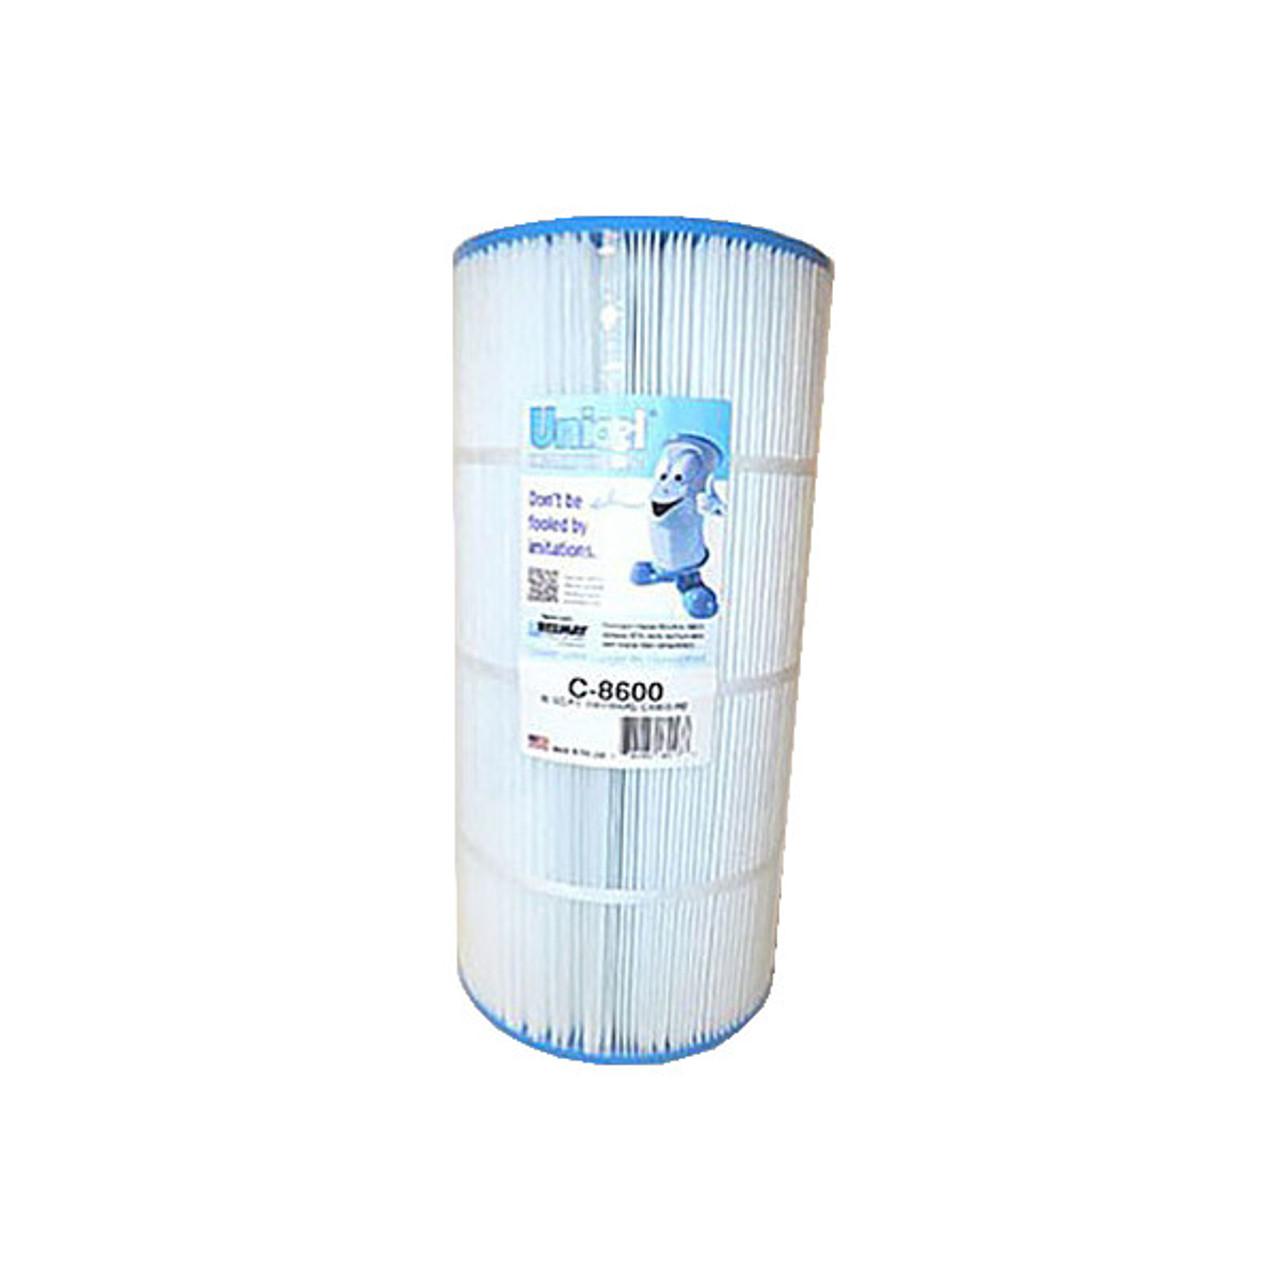 Unicel C 8600 Hot Tub Filter Canada